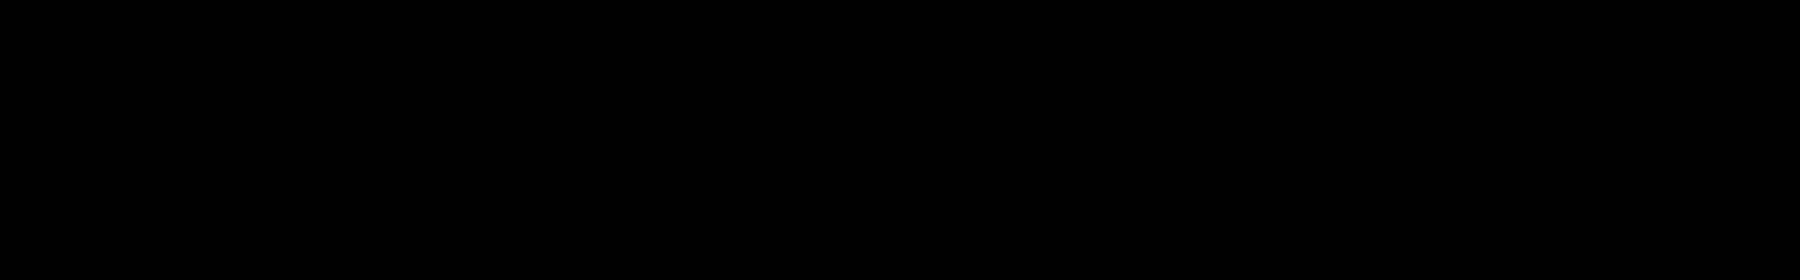 Hook audio waveform